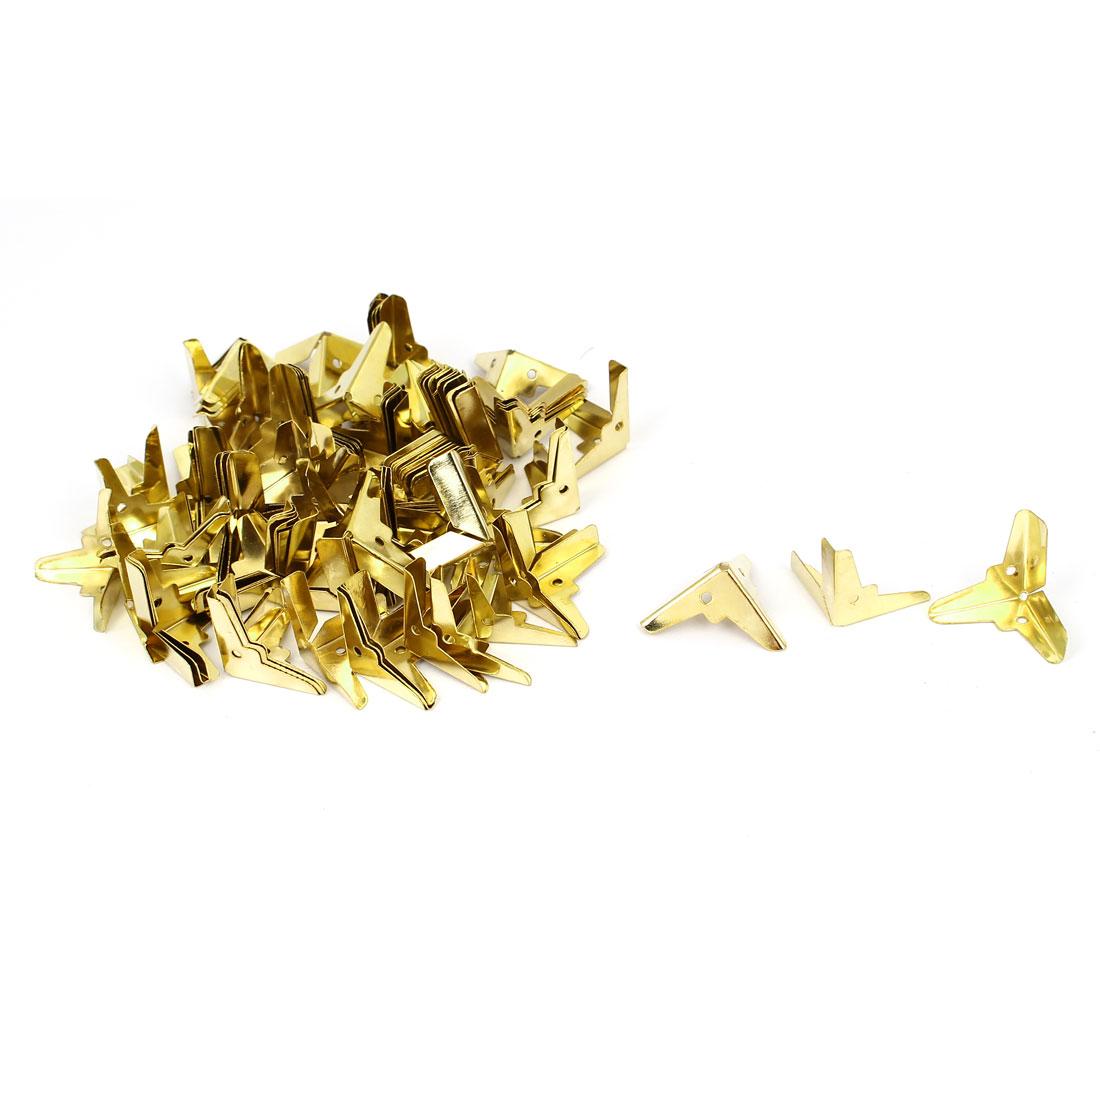 Decorative Antique Jewelry Gift Box Corner Protector Guard Gold Tone 100pcs